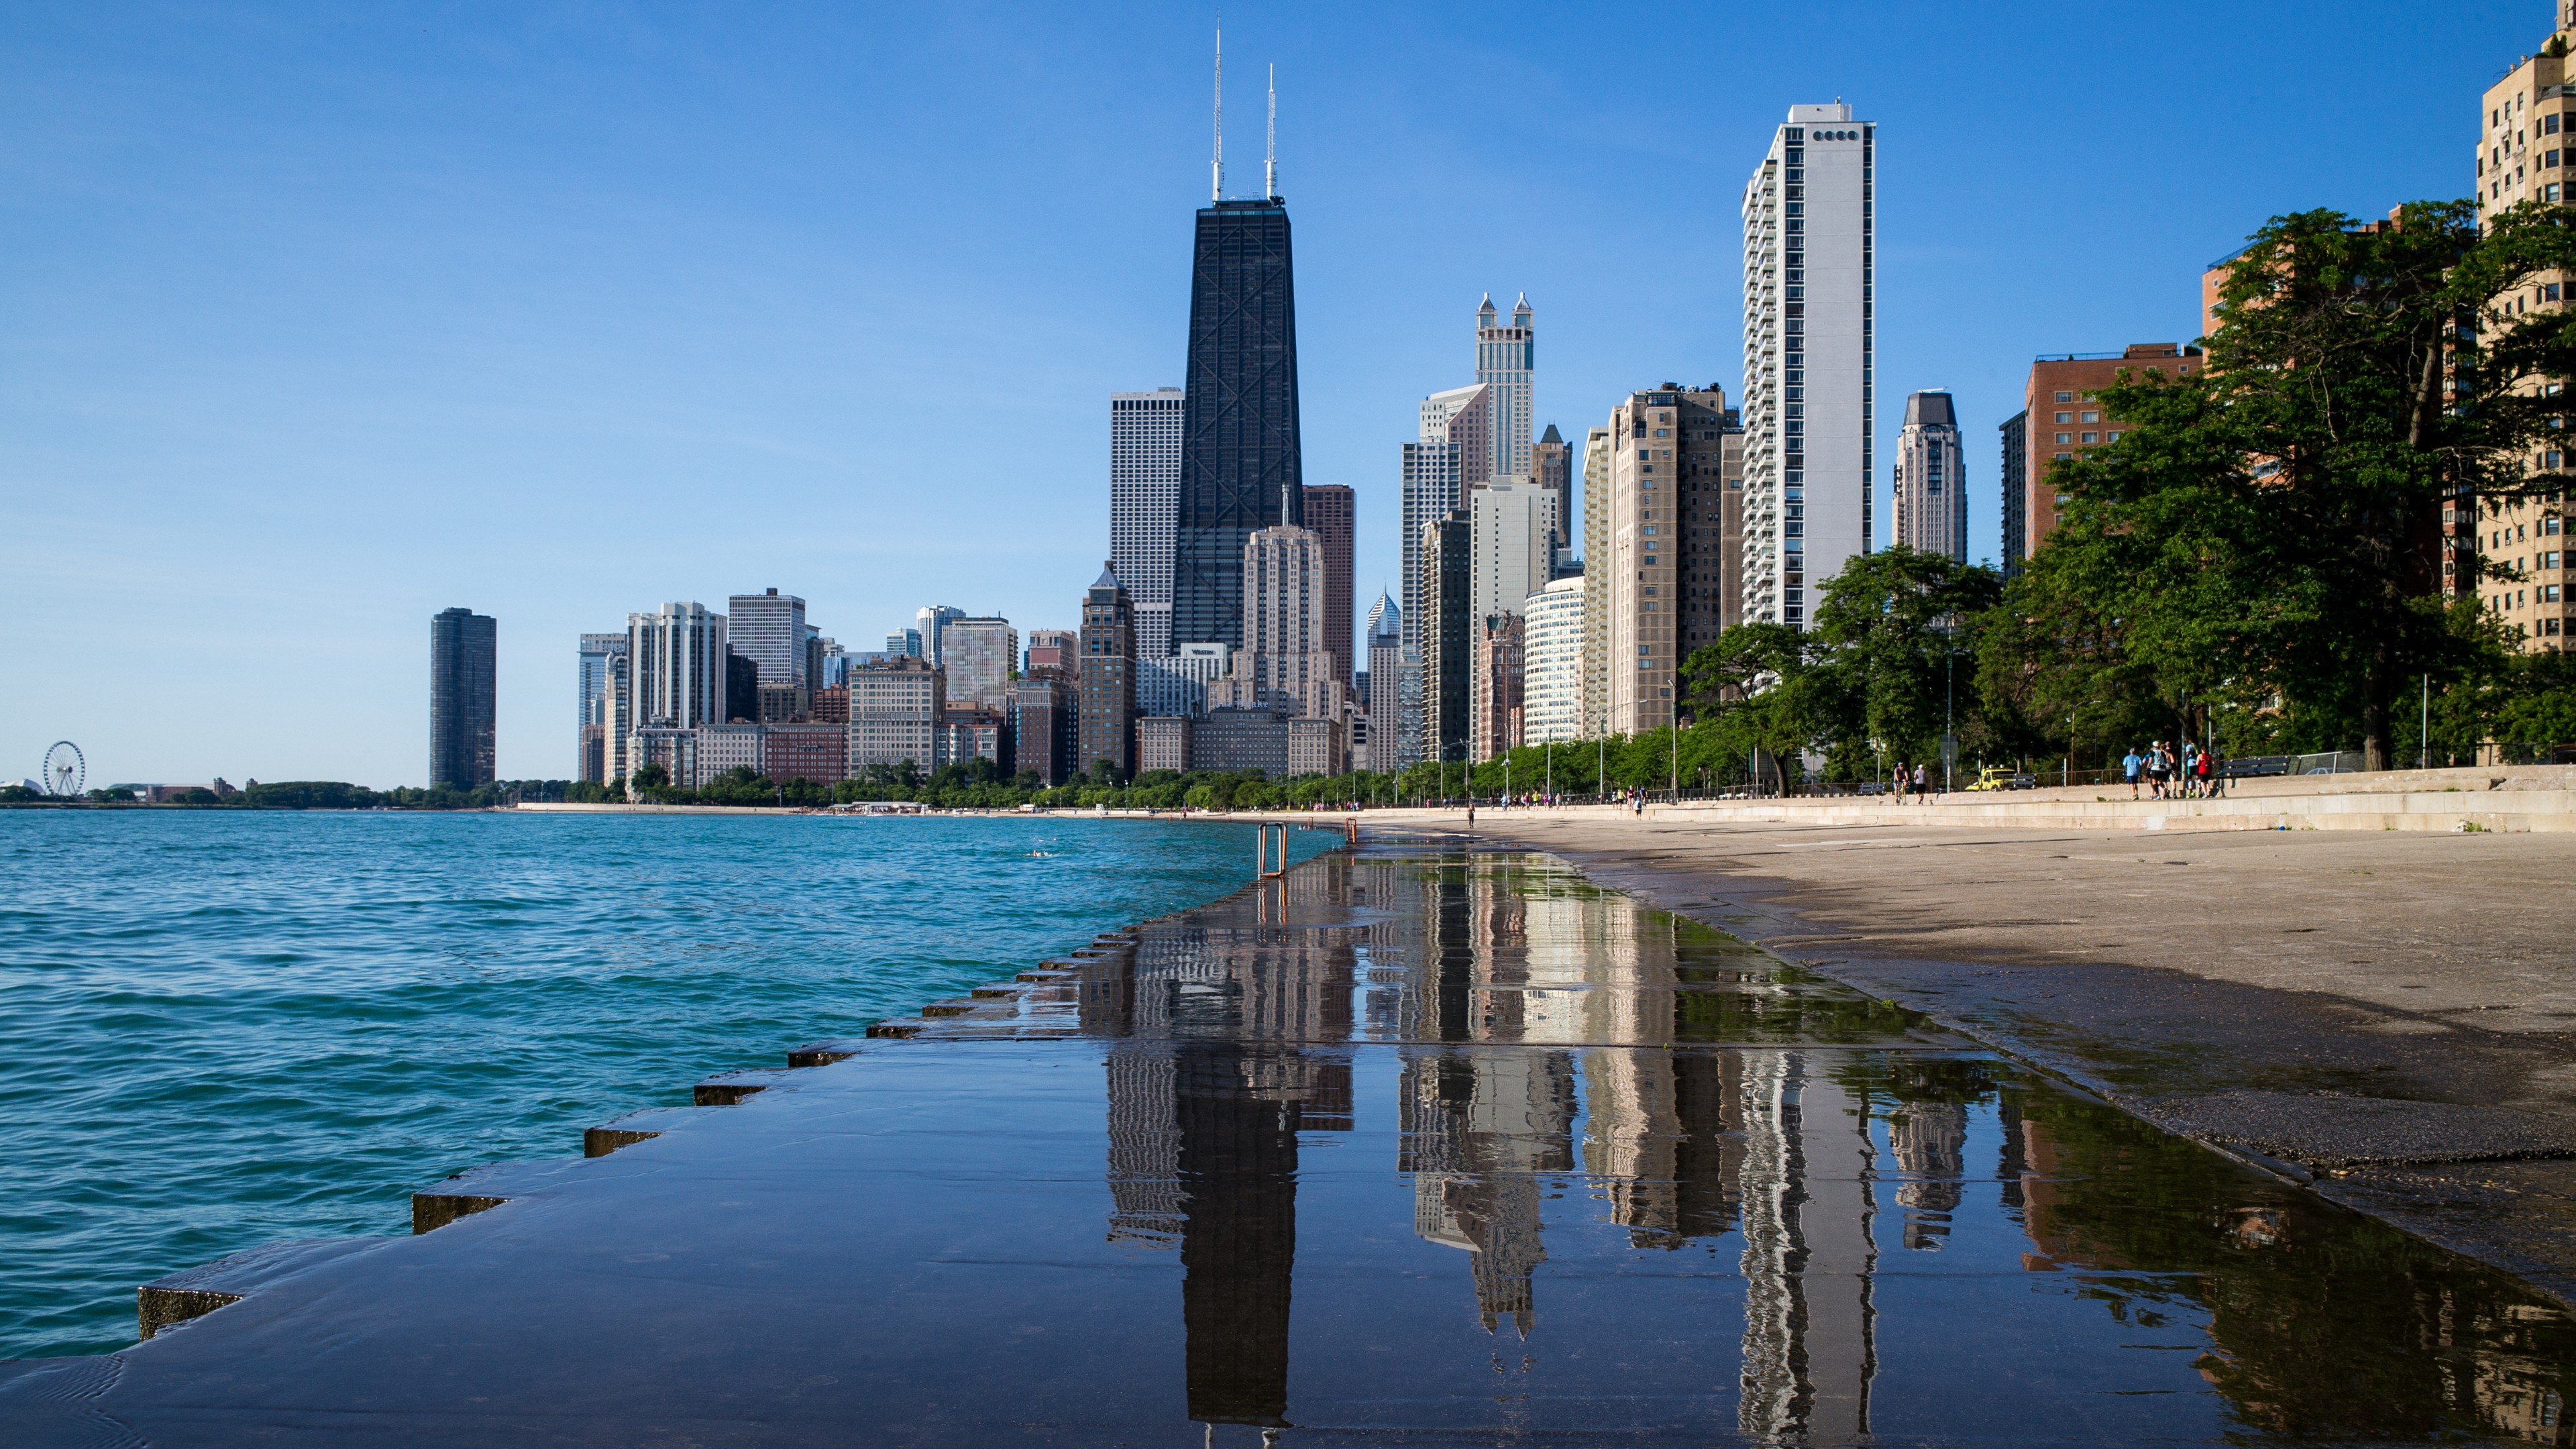 Chicago skyscrapers mirroring wallpaper